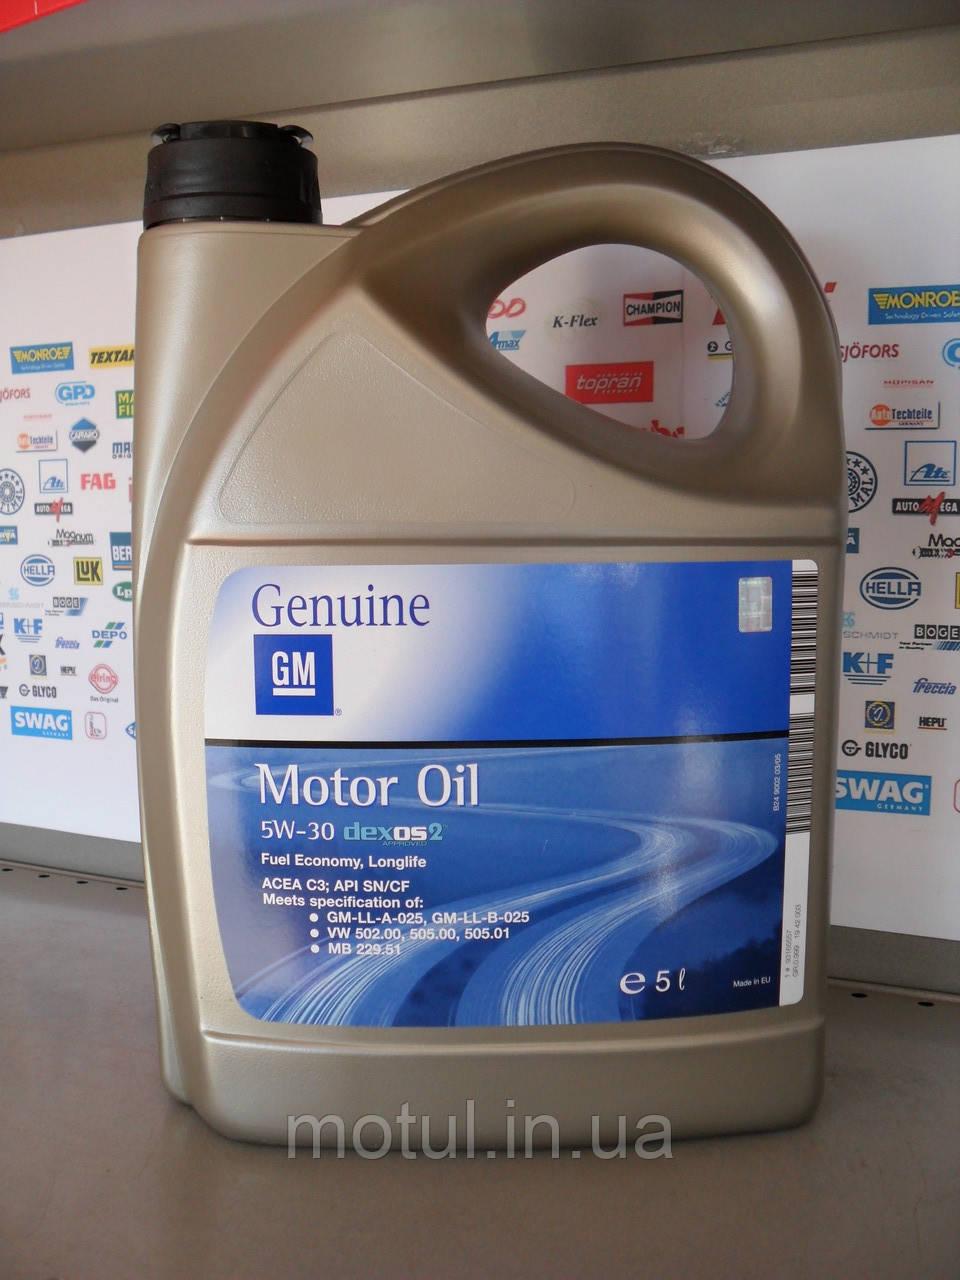 Моторное масло Gm 5w30 5л